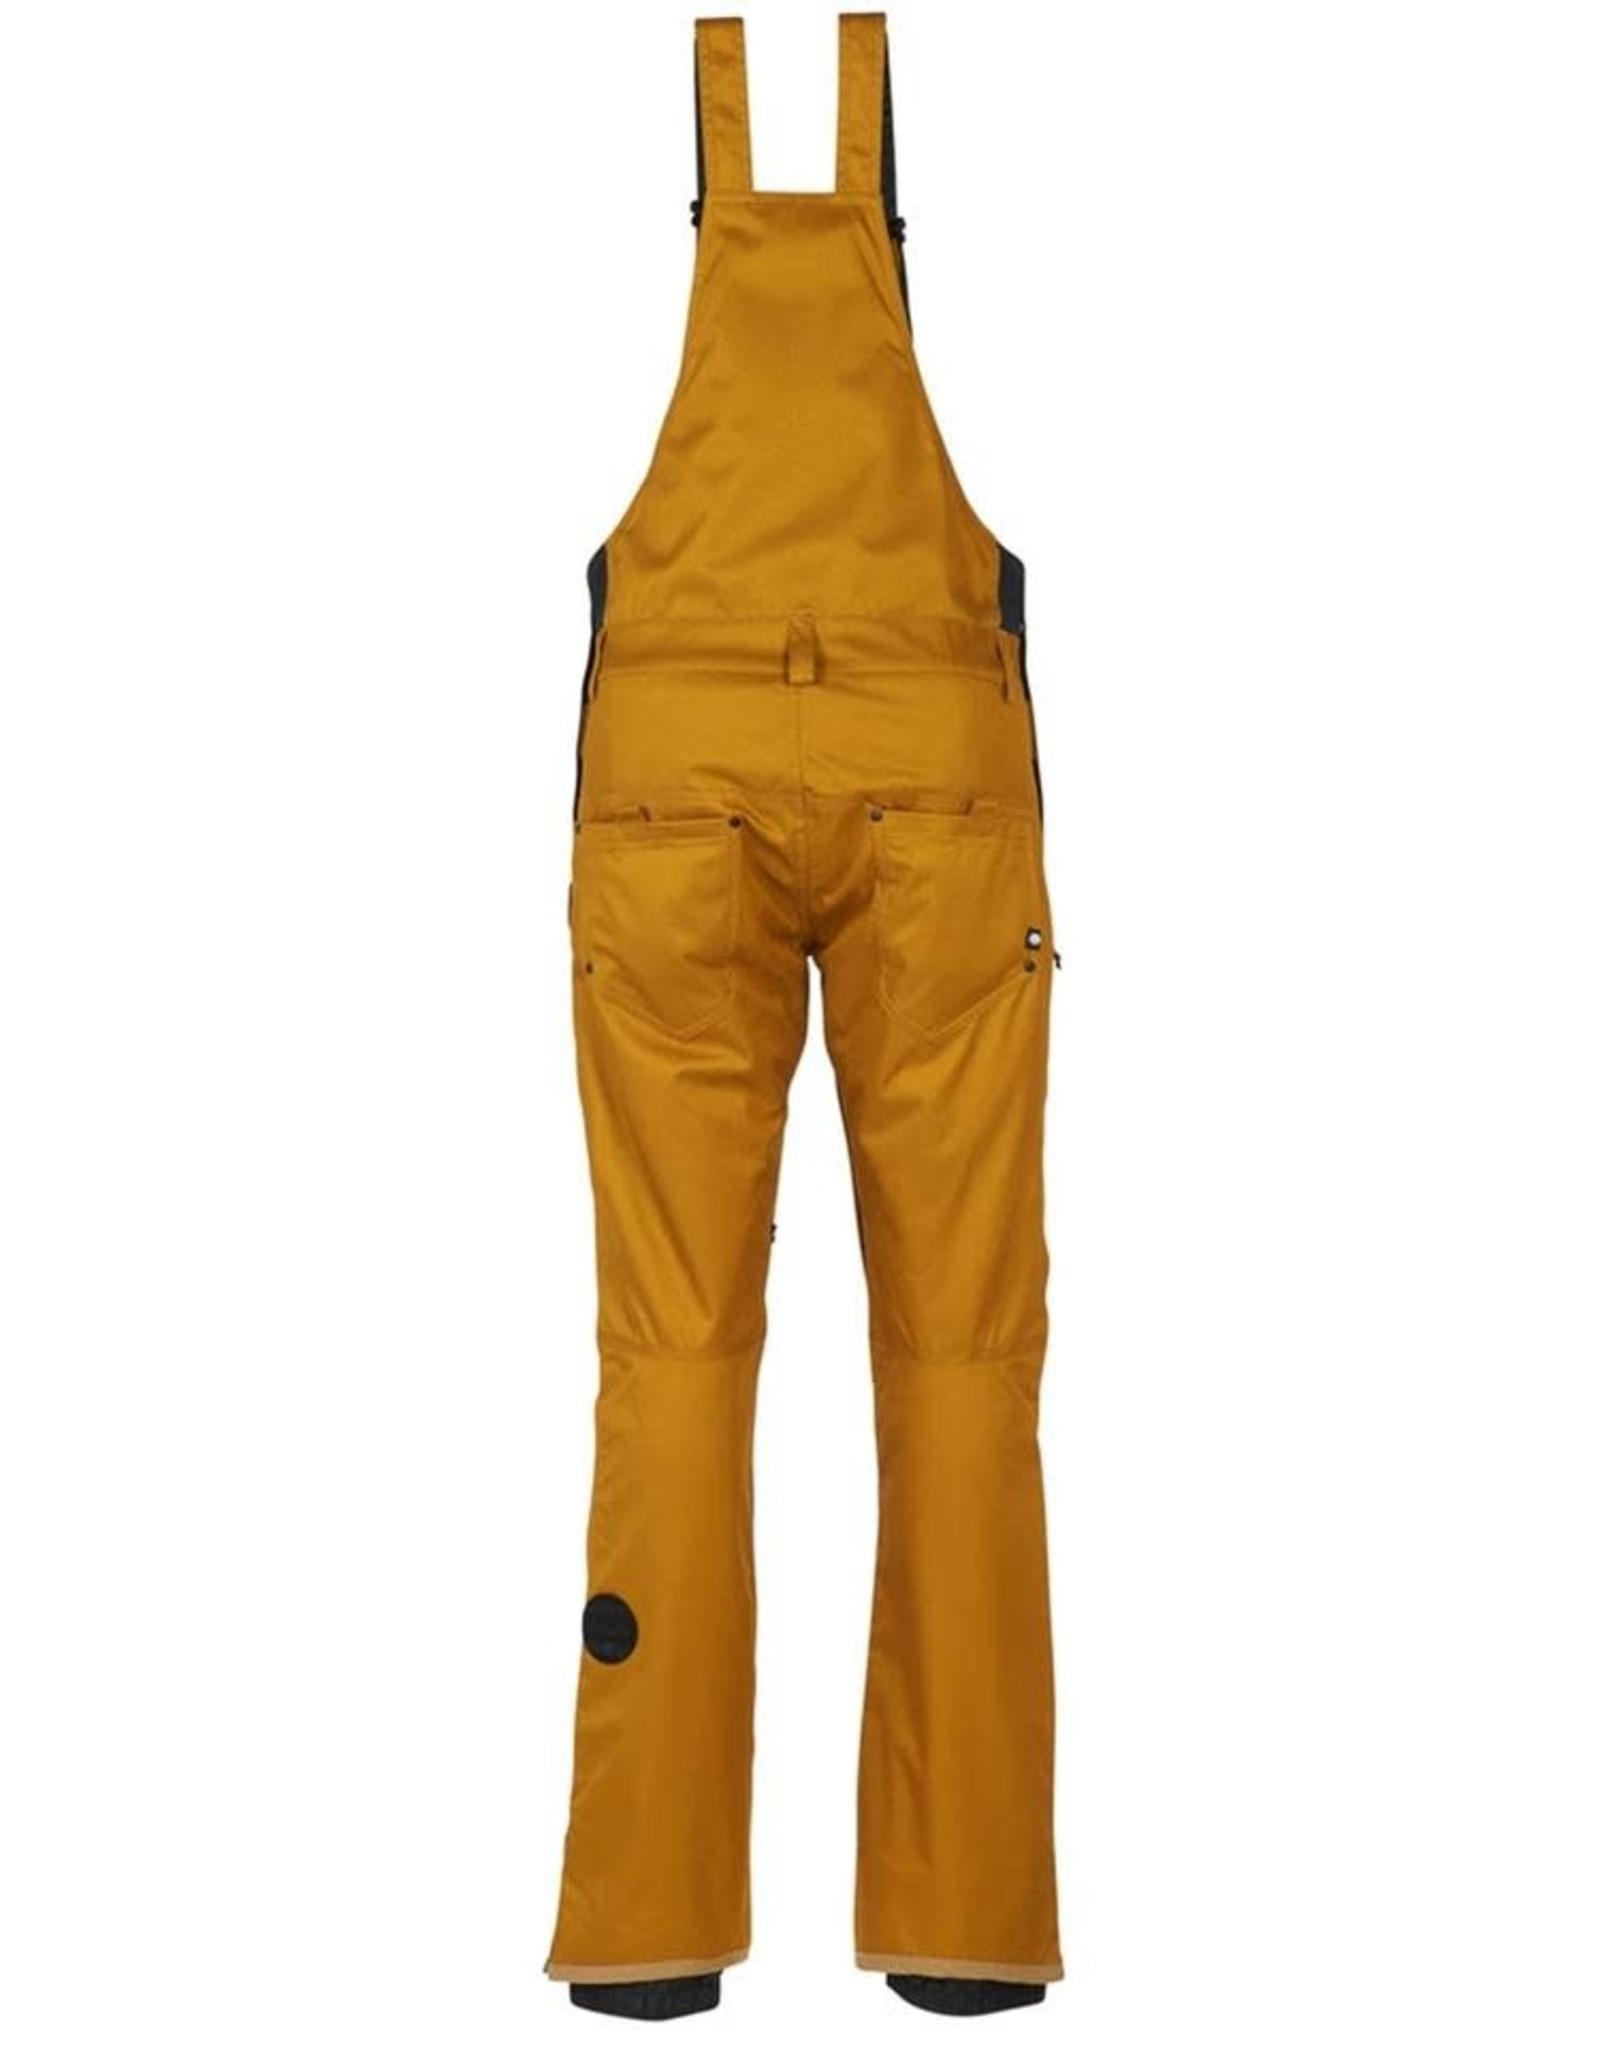 686 686 - pantalon femme black magic insulated bib golden brown